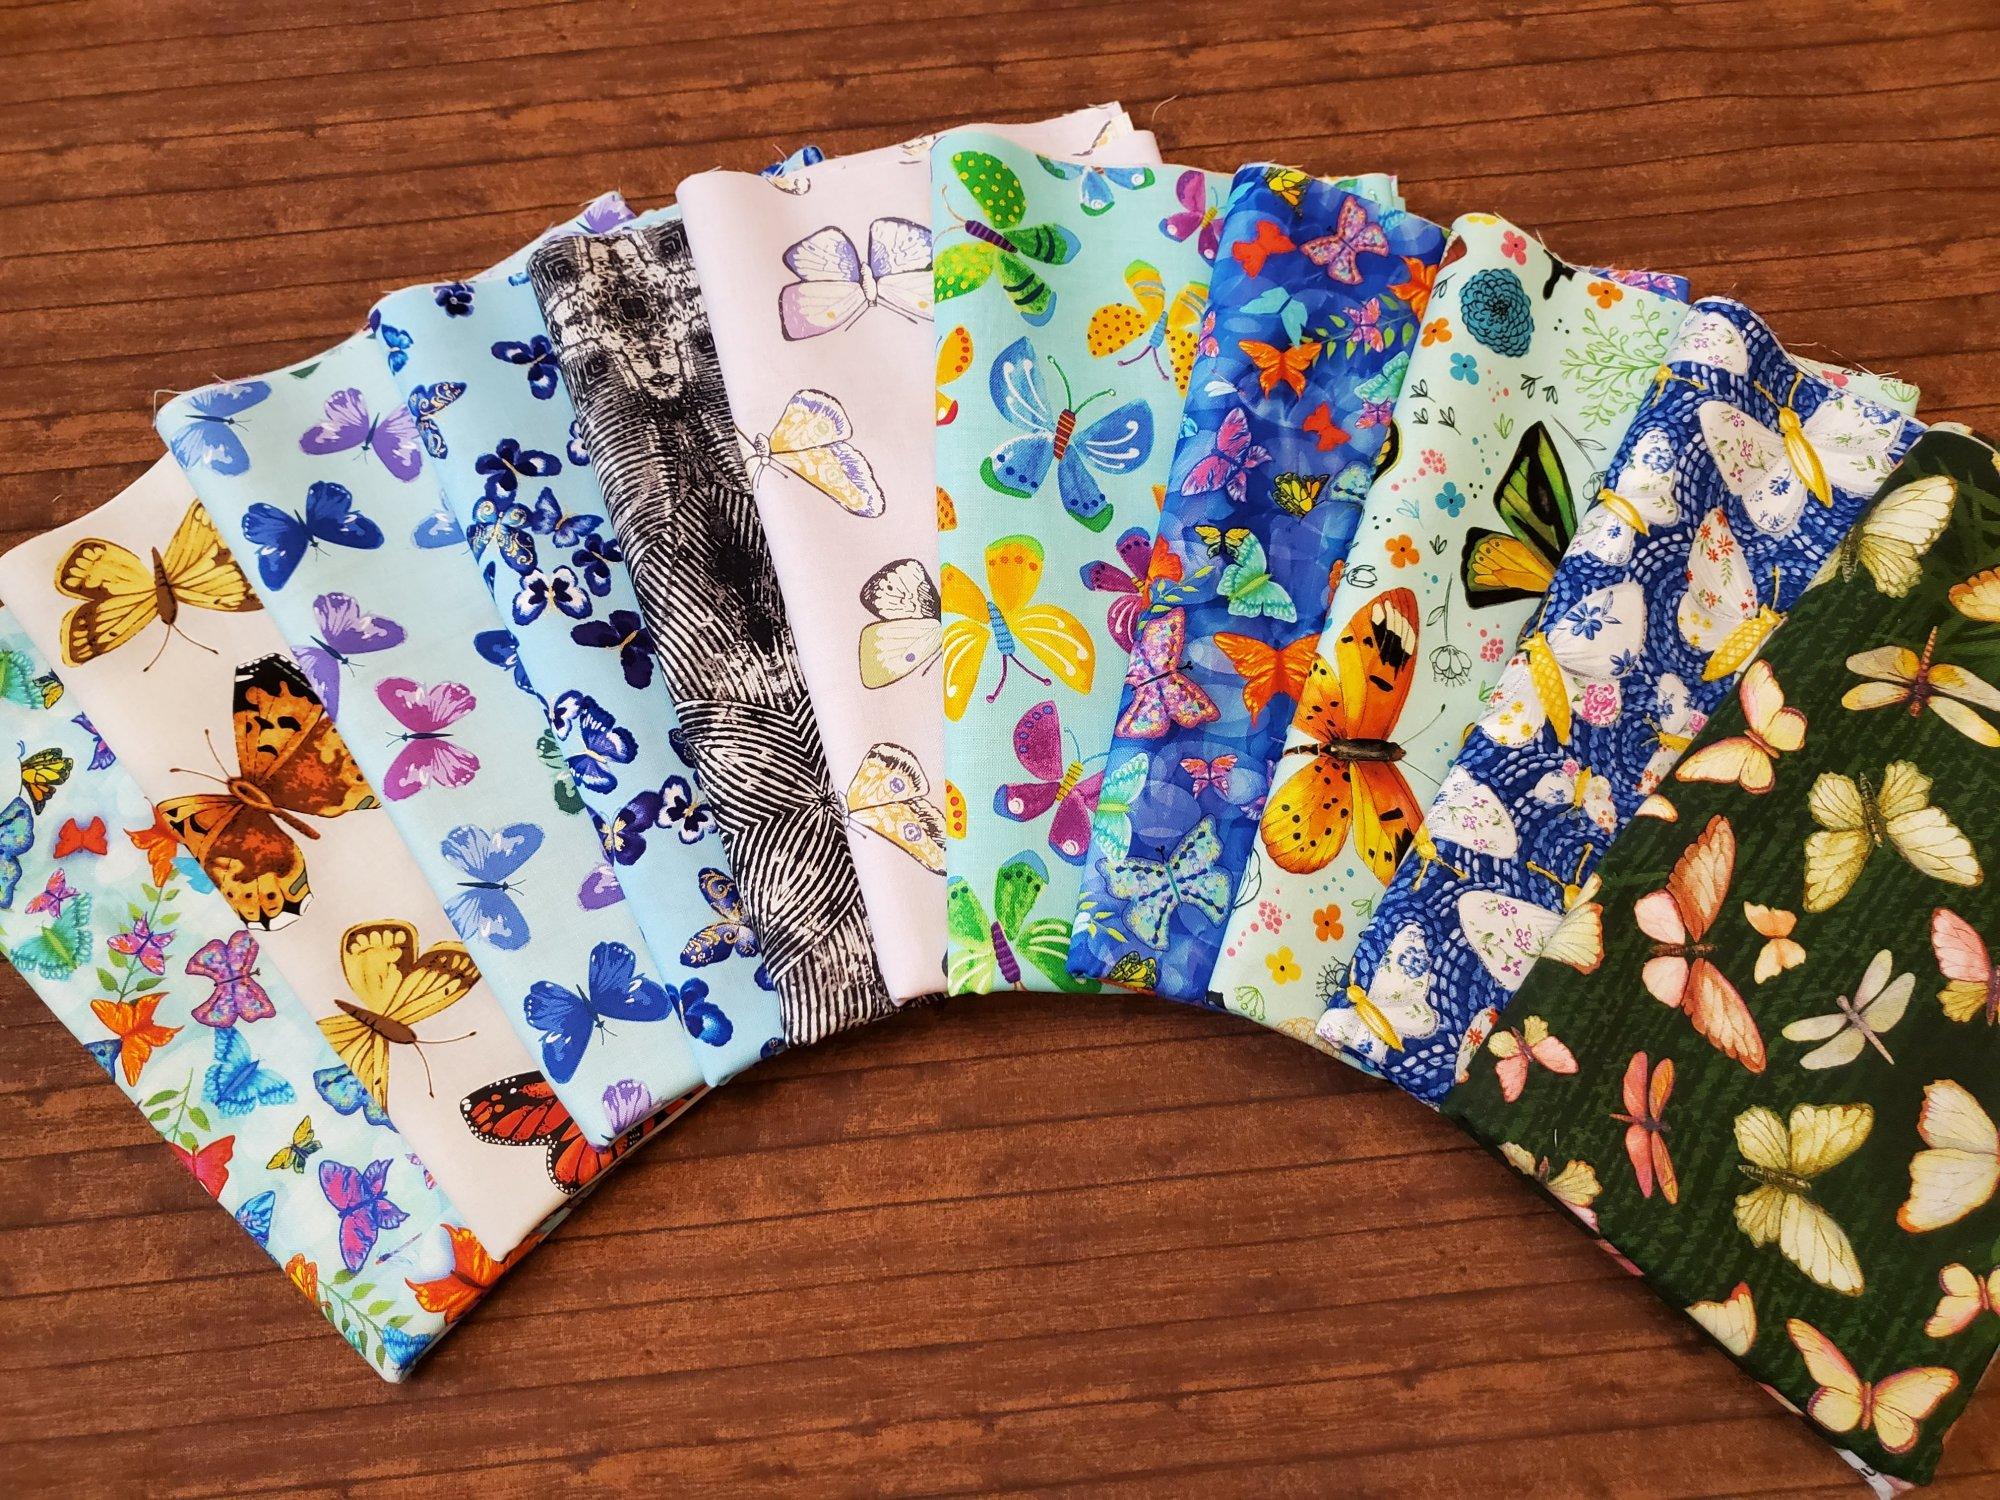 Butterflies in Flight - Various Manufacturers - 11 piece Half Yard Bundle Pack